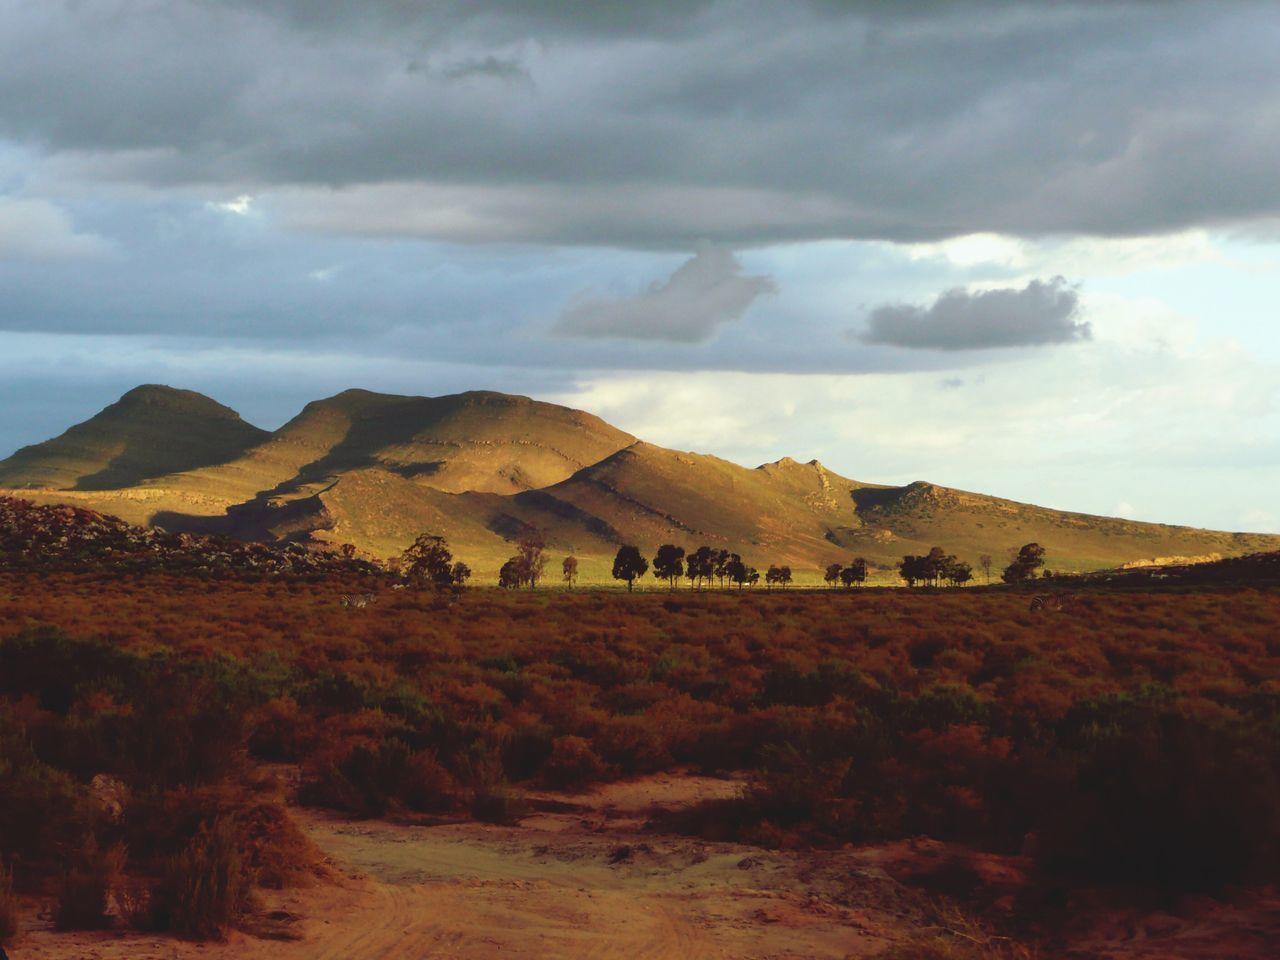 Beautiful stock photos of afrika, landscape, tranquil scene, scenics, tranquility